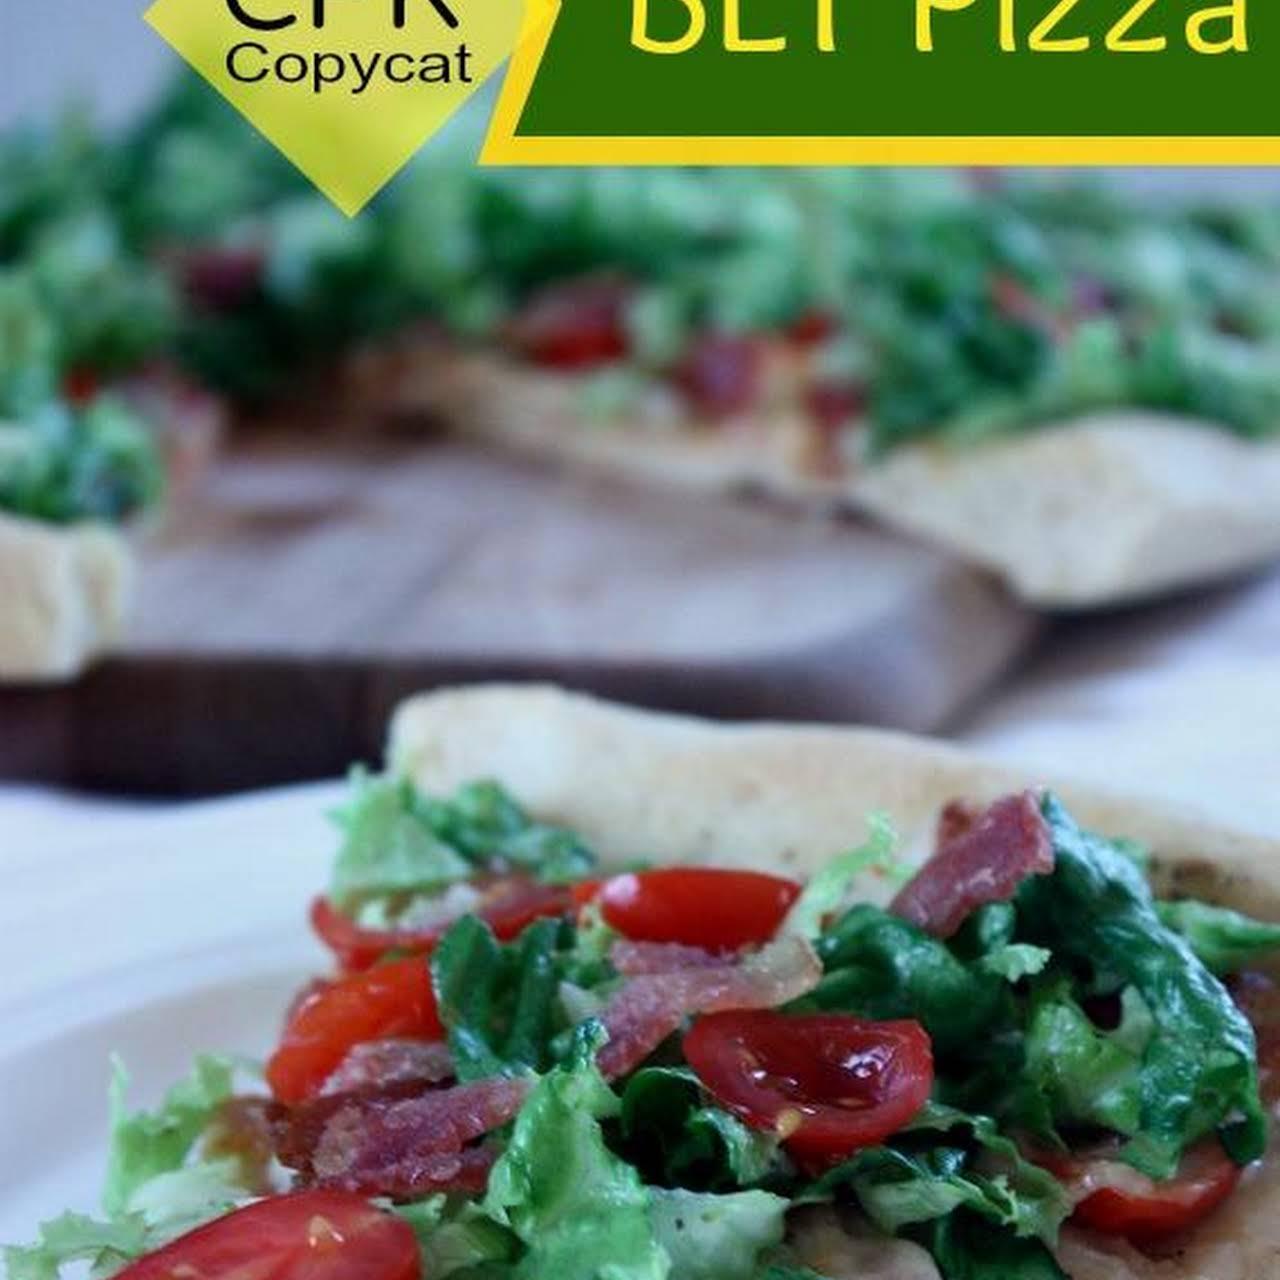 Copycat California Pizza Kitchen BLT Pizza